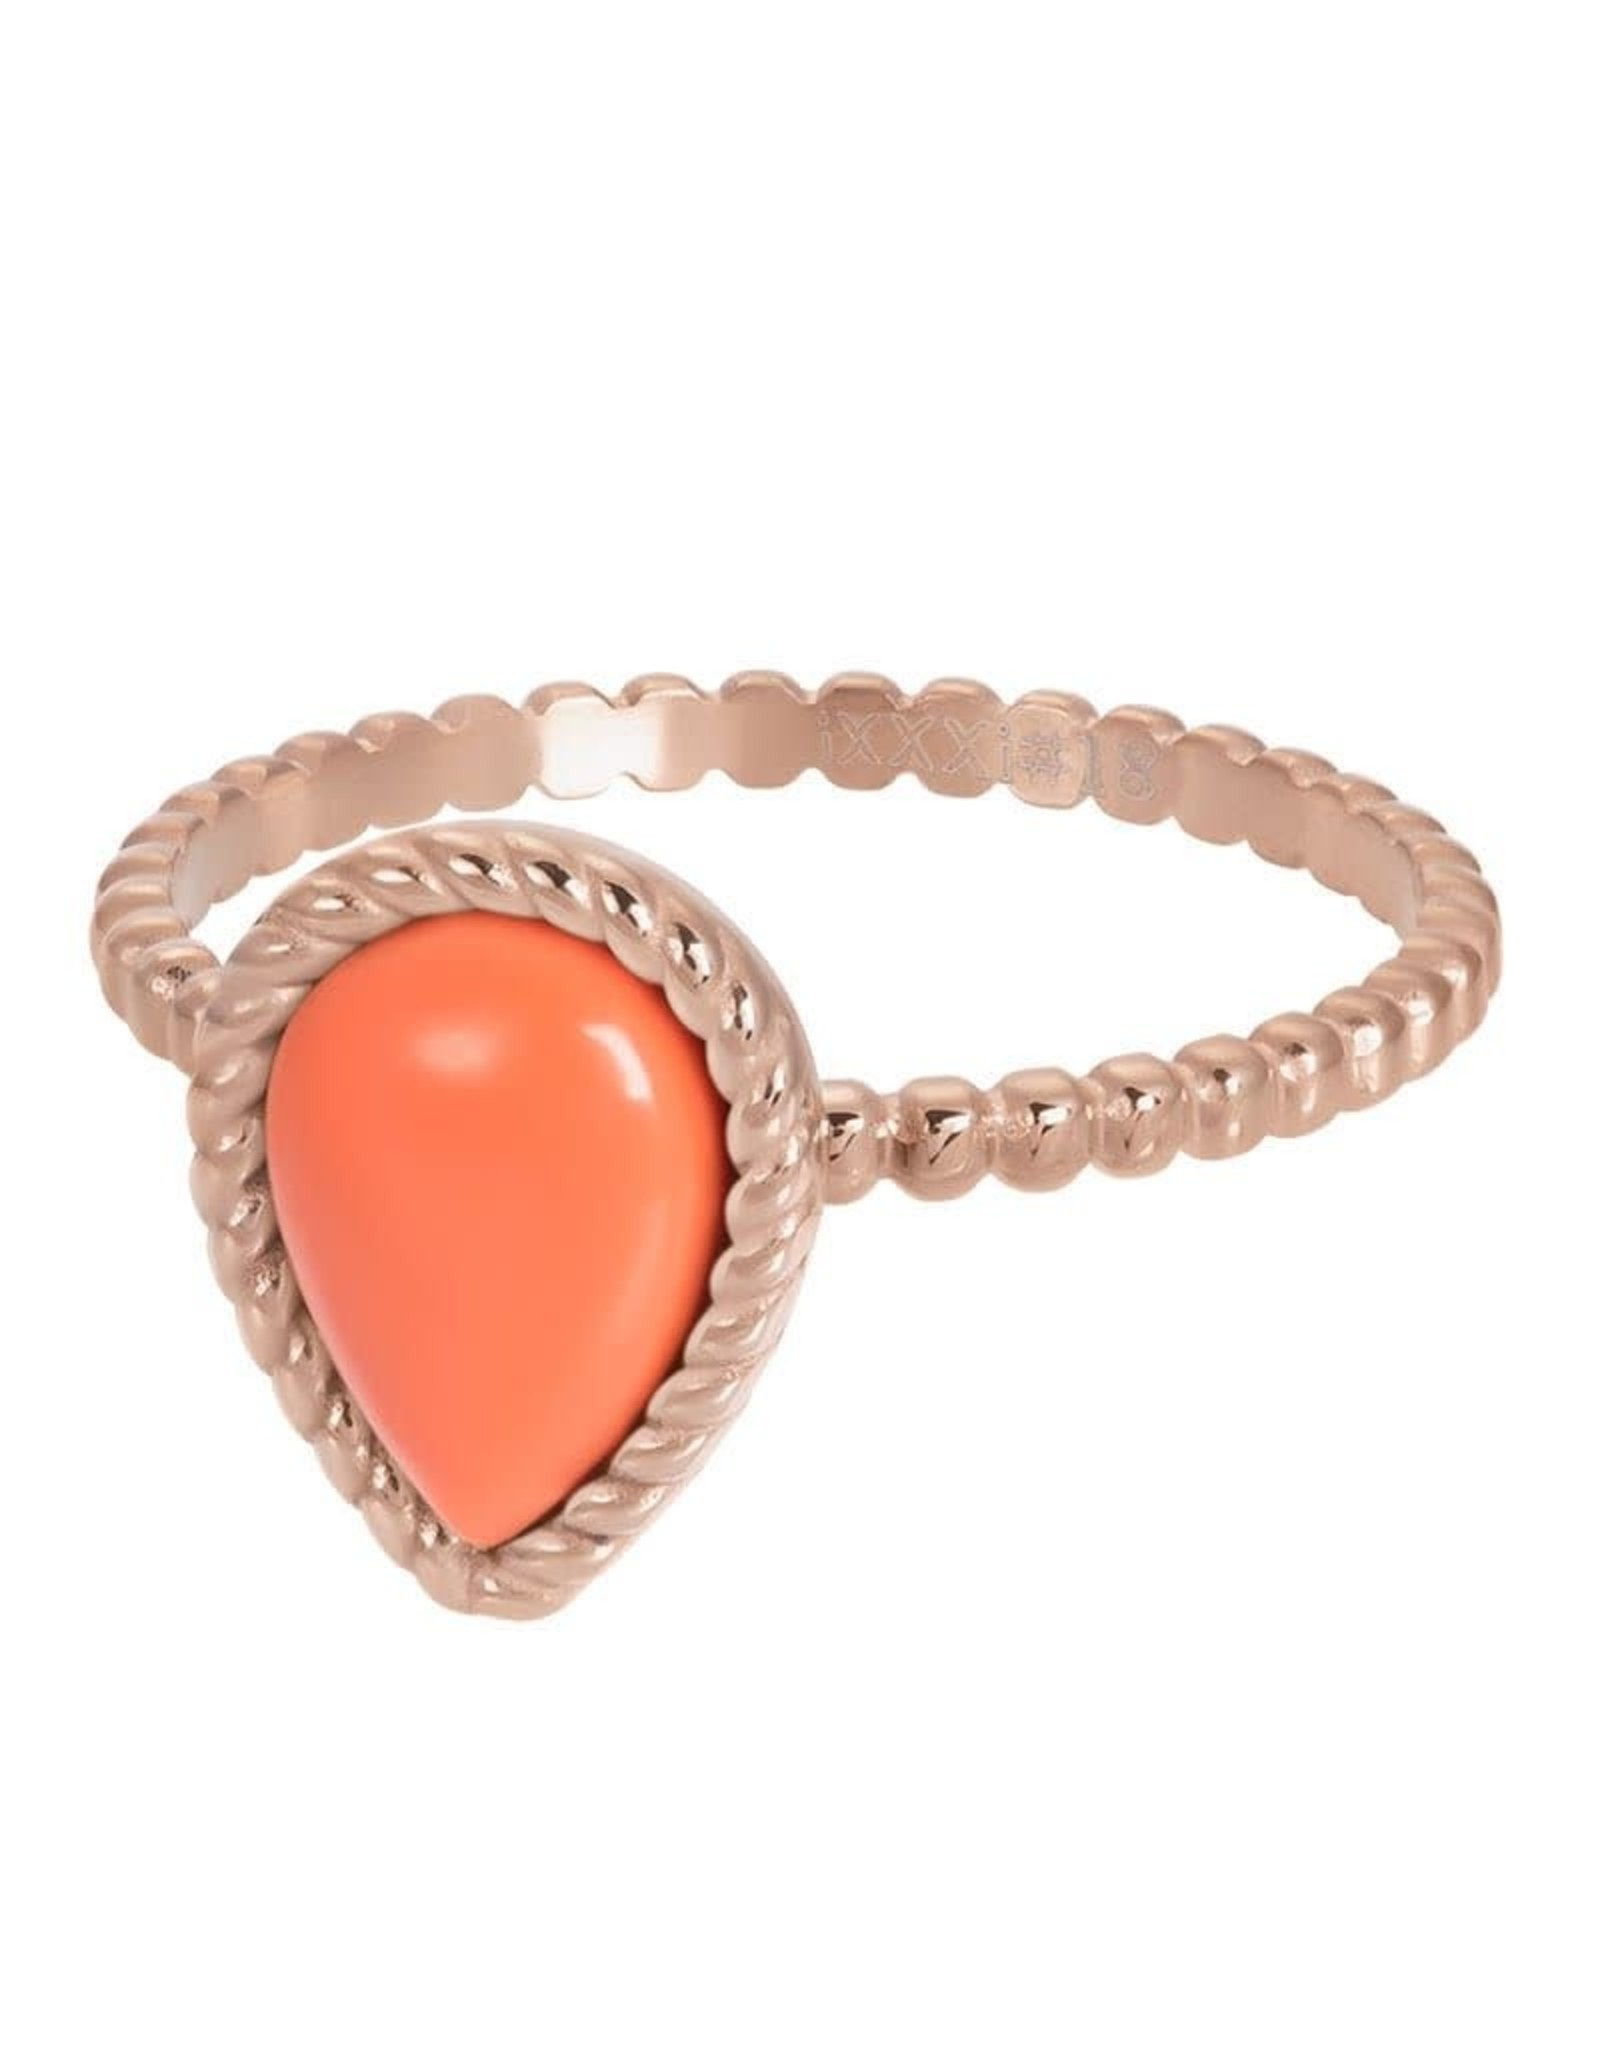 iXXXi Jewelry iXXXi vulring Magic coral - rose